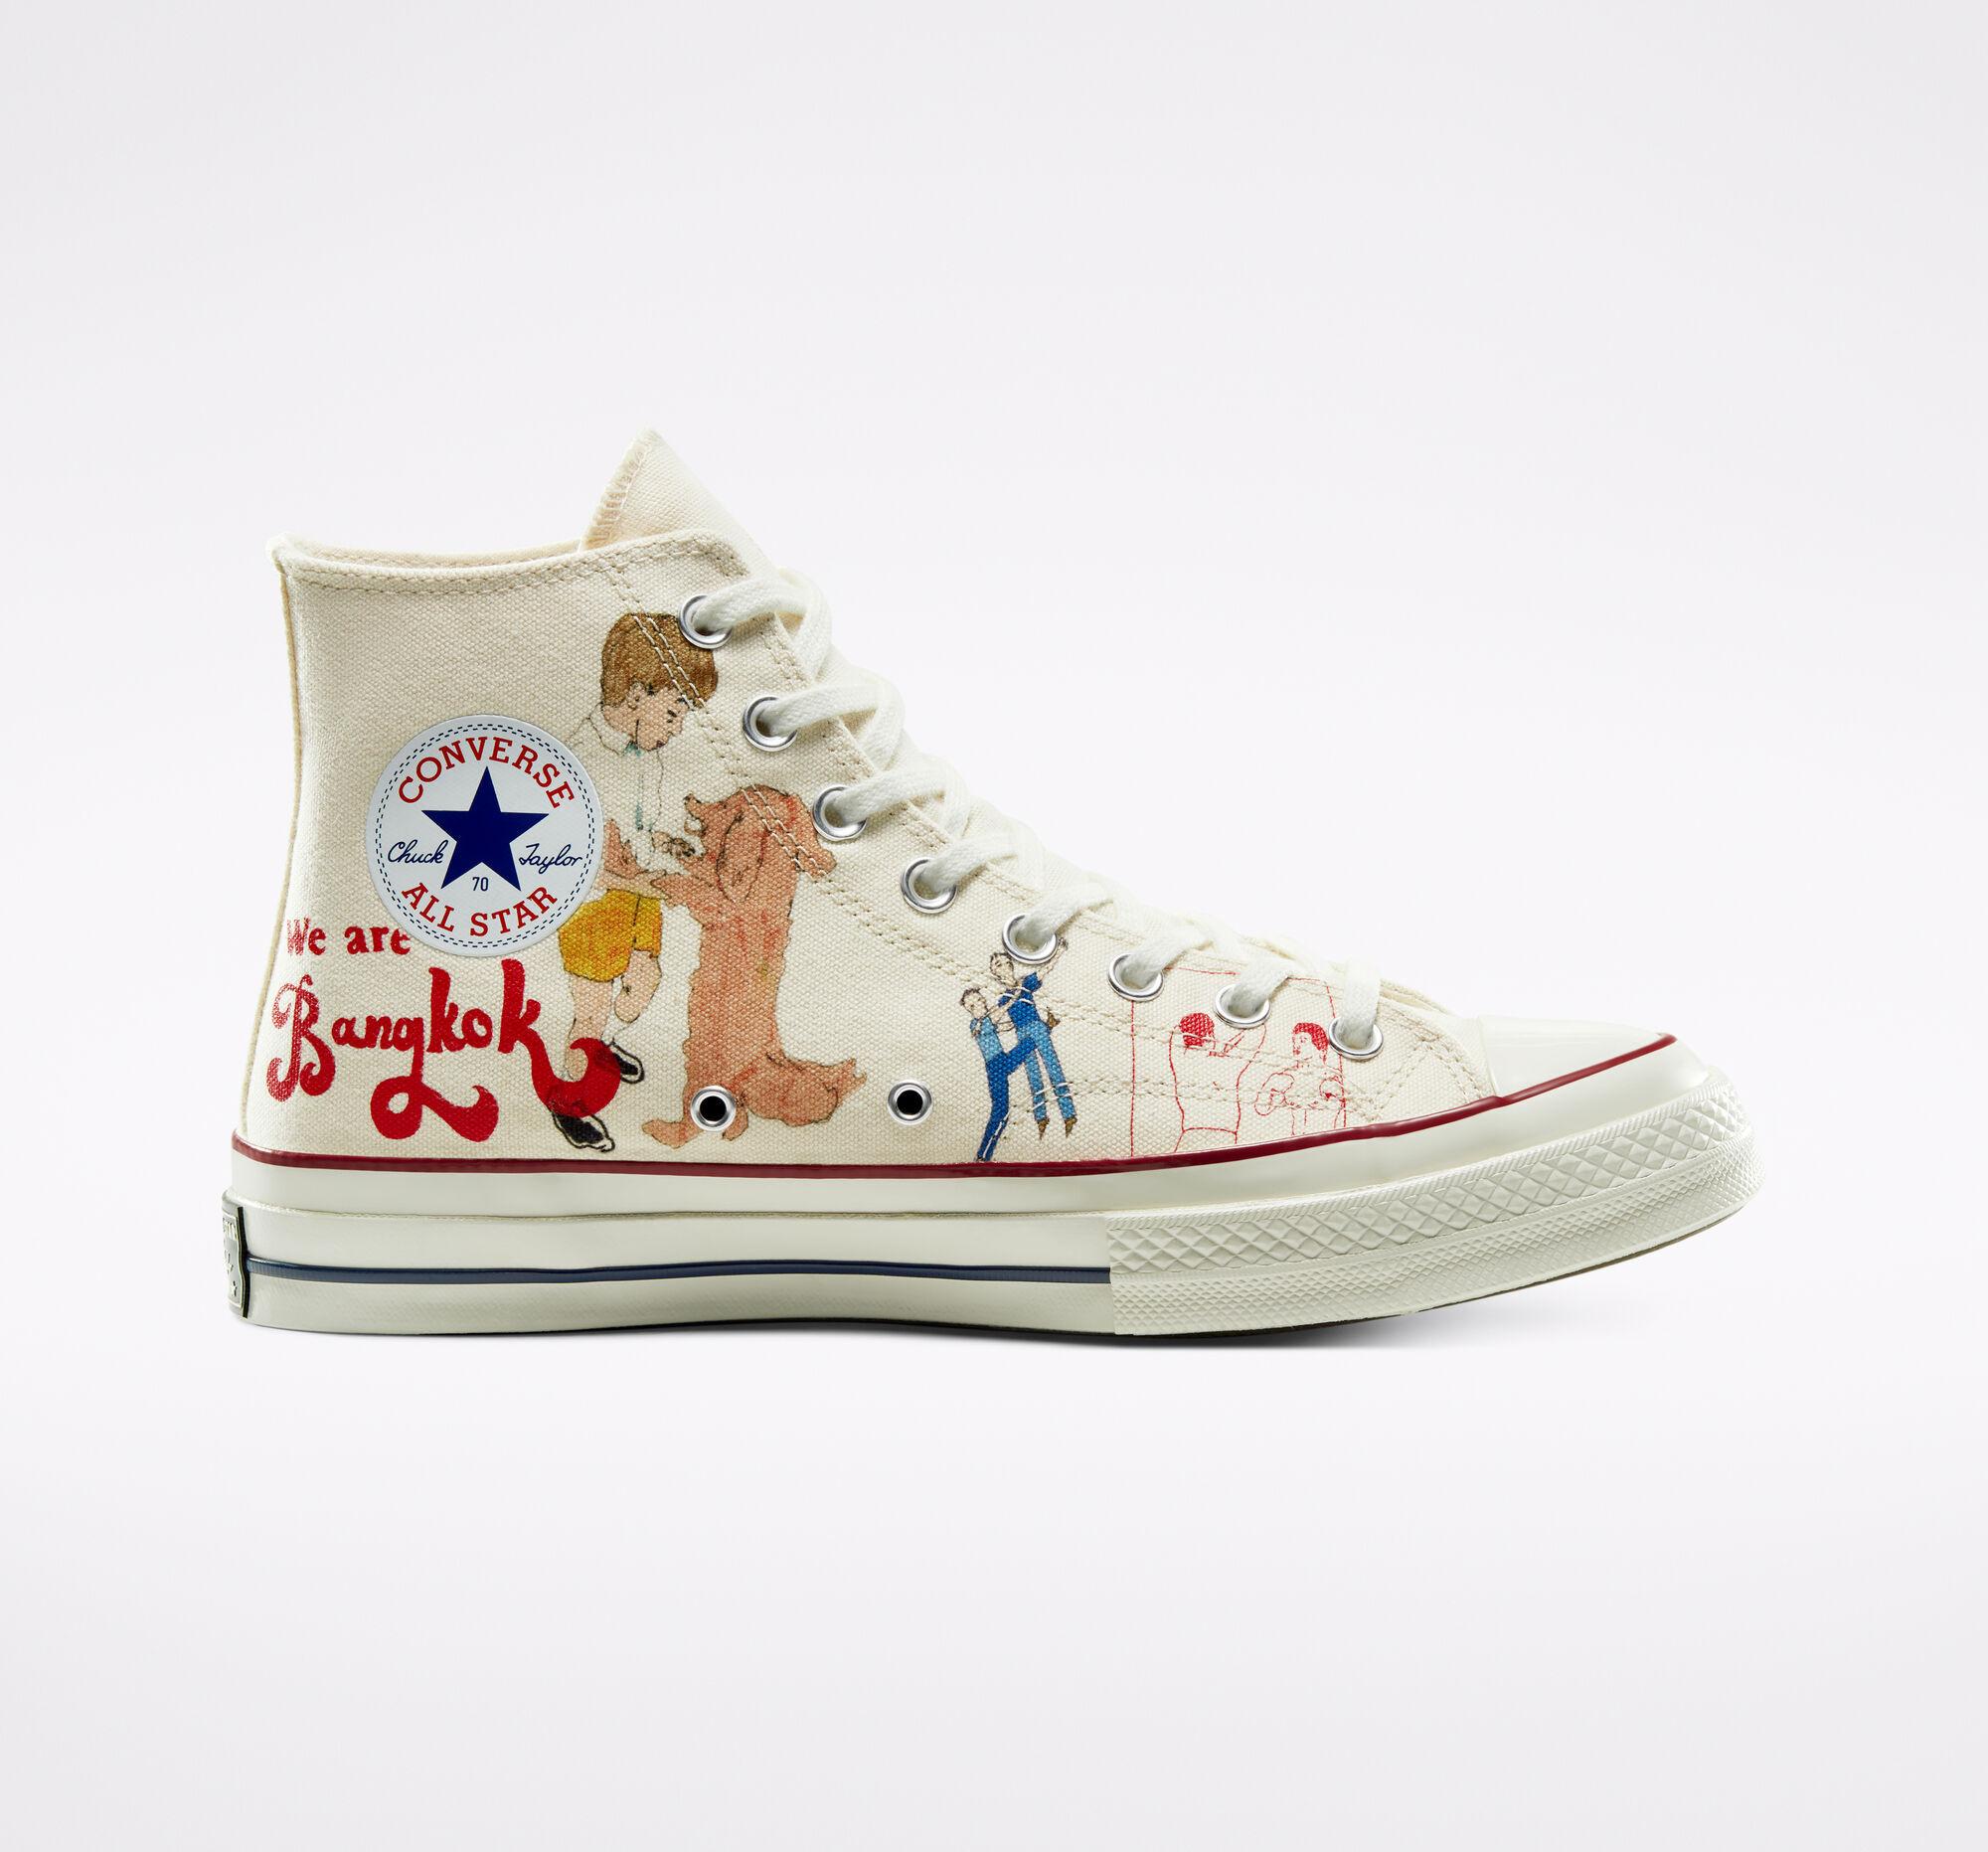 Converse 匡威英國官網:年中大促 低至6折起 ¥434收明星同款帆布鞋!